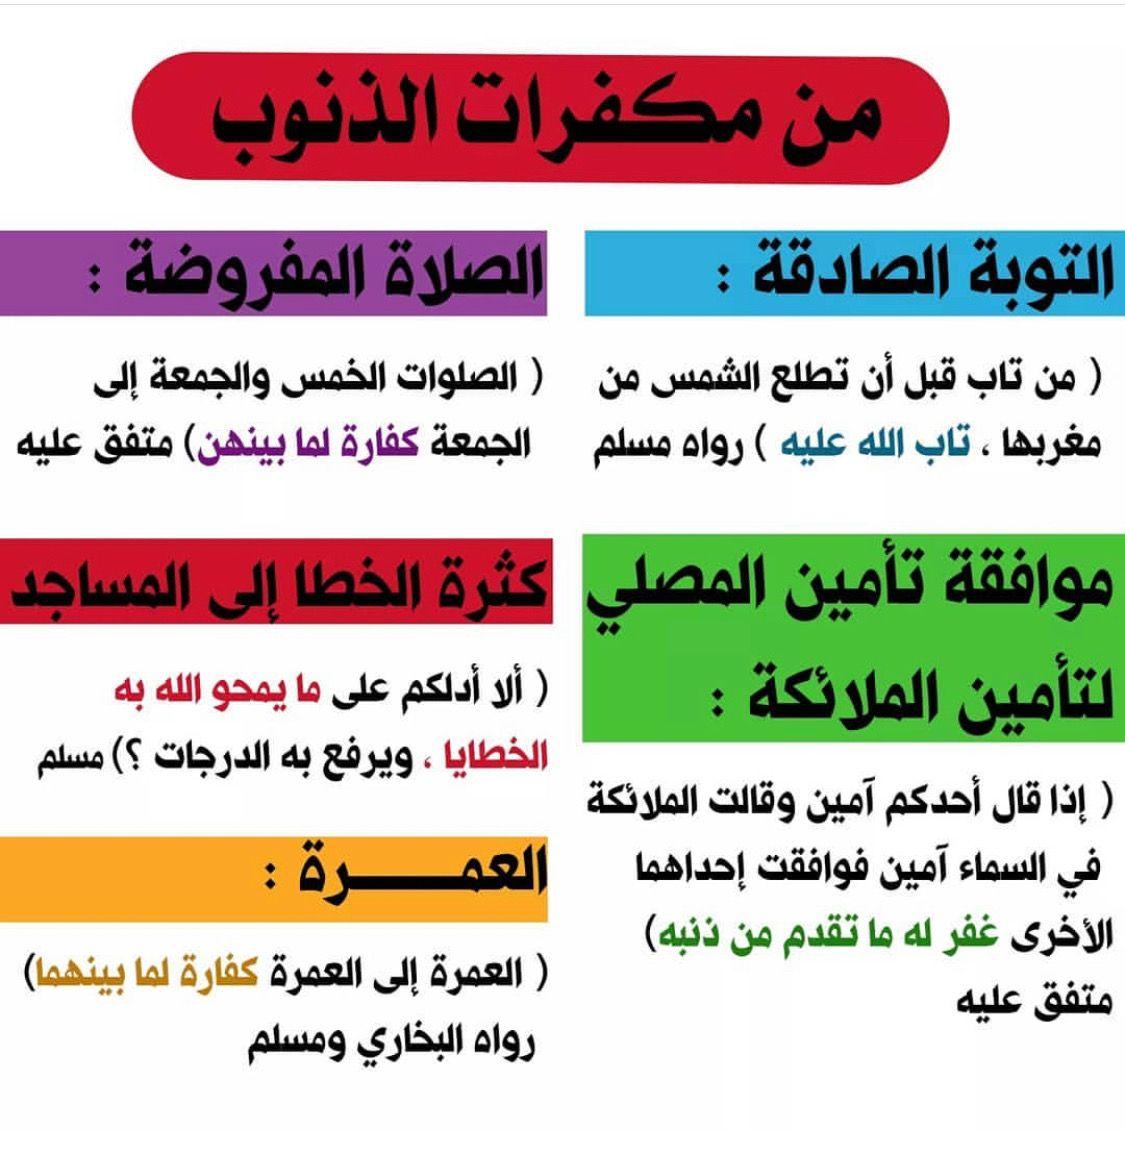 حديث صحيح مكفرات الذنوب How Are You Feeling Islamic Pictures Feelings